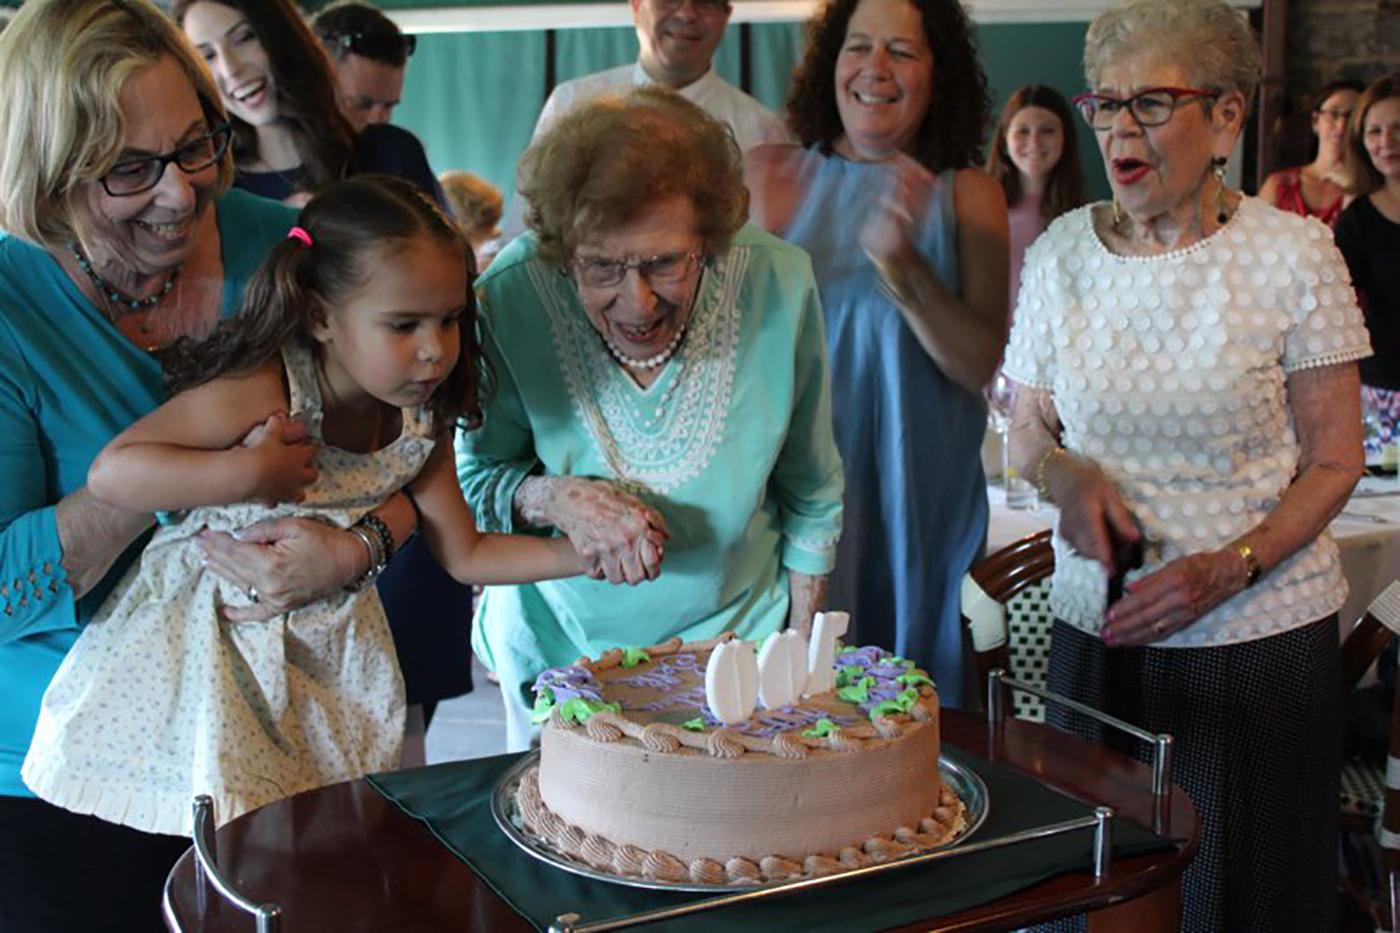 Meet Belle, Alexa's 103-year-old best friend - Image 1